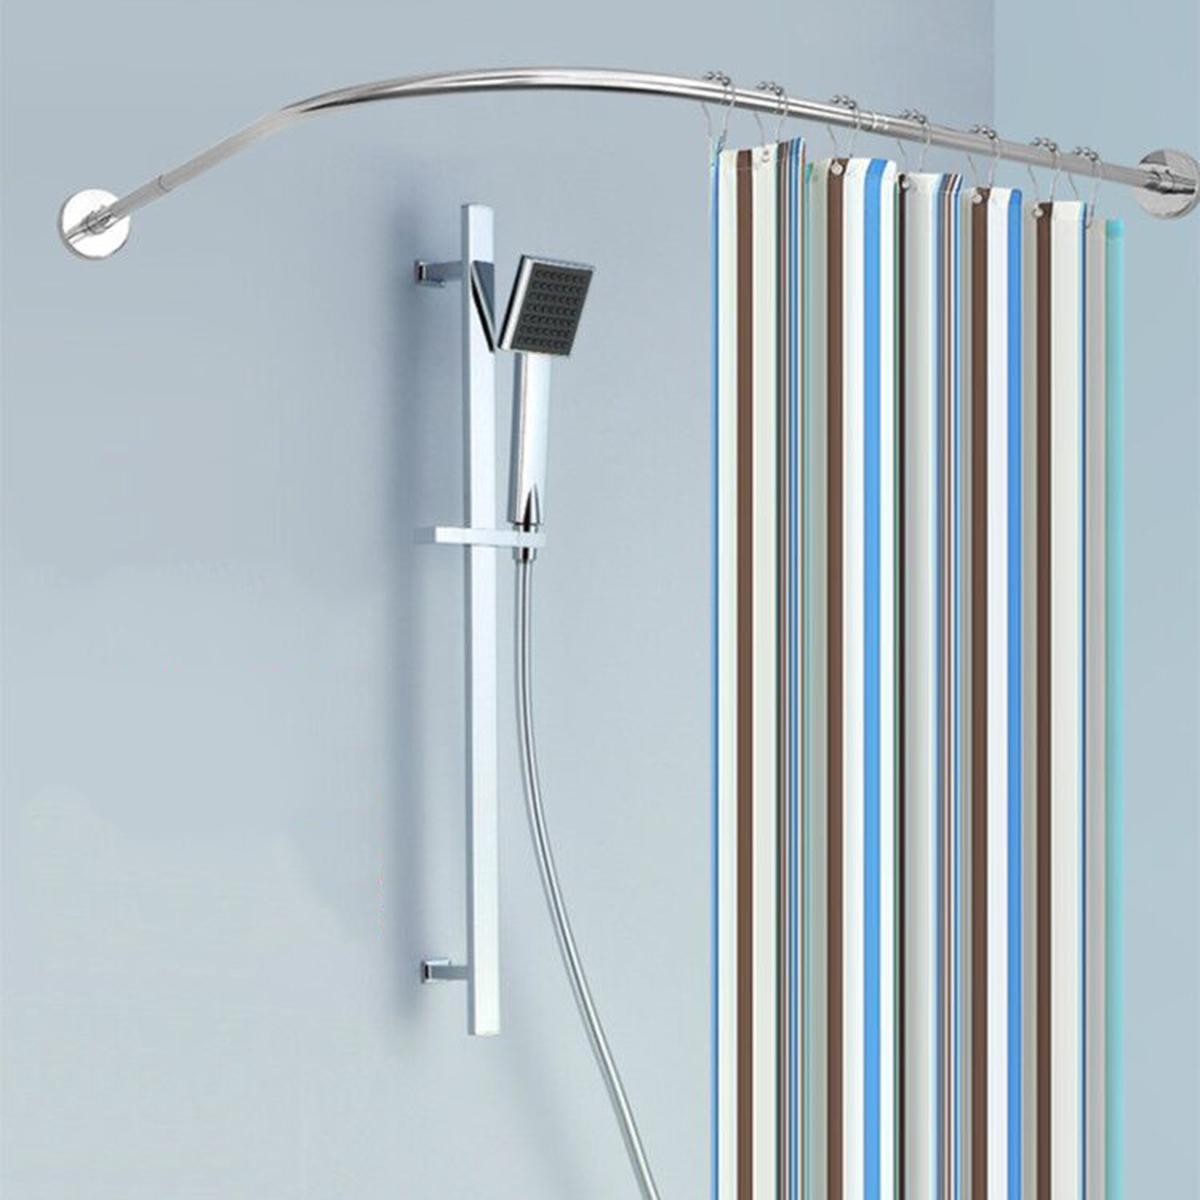 expandable curved shower curtain rod 40 64inch bath tub corner curtain rail clip track rail hardware shower curtain poles